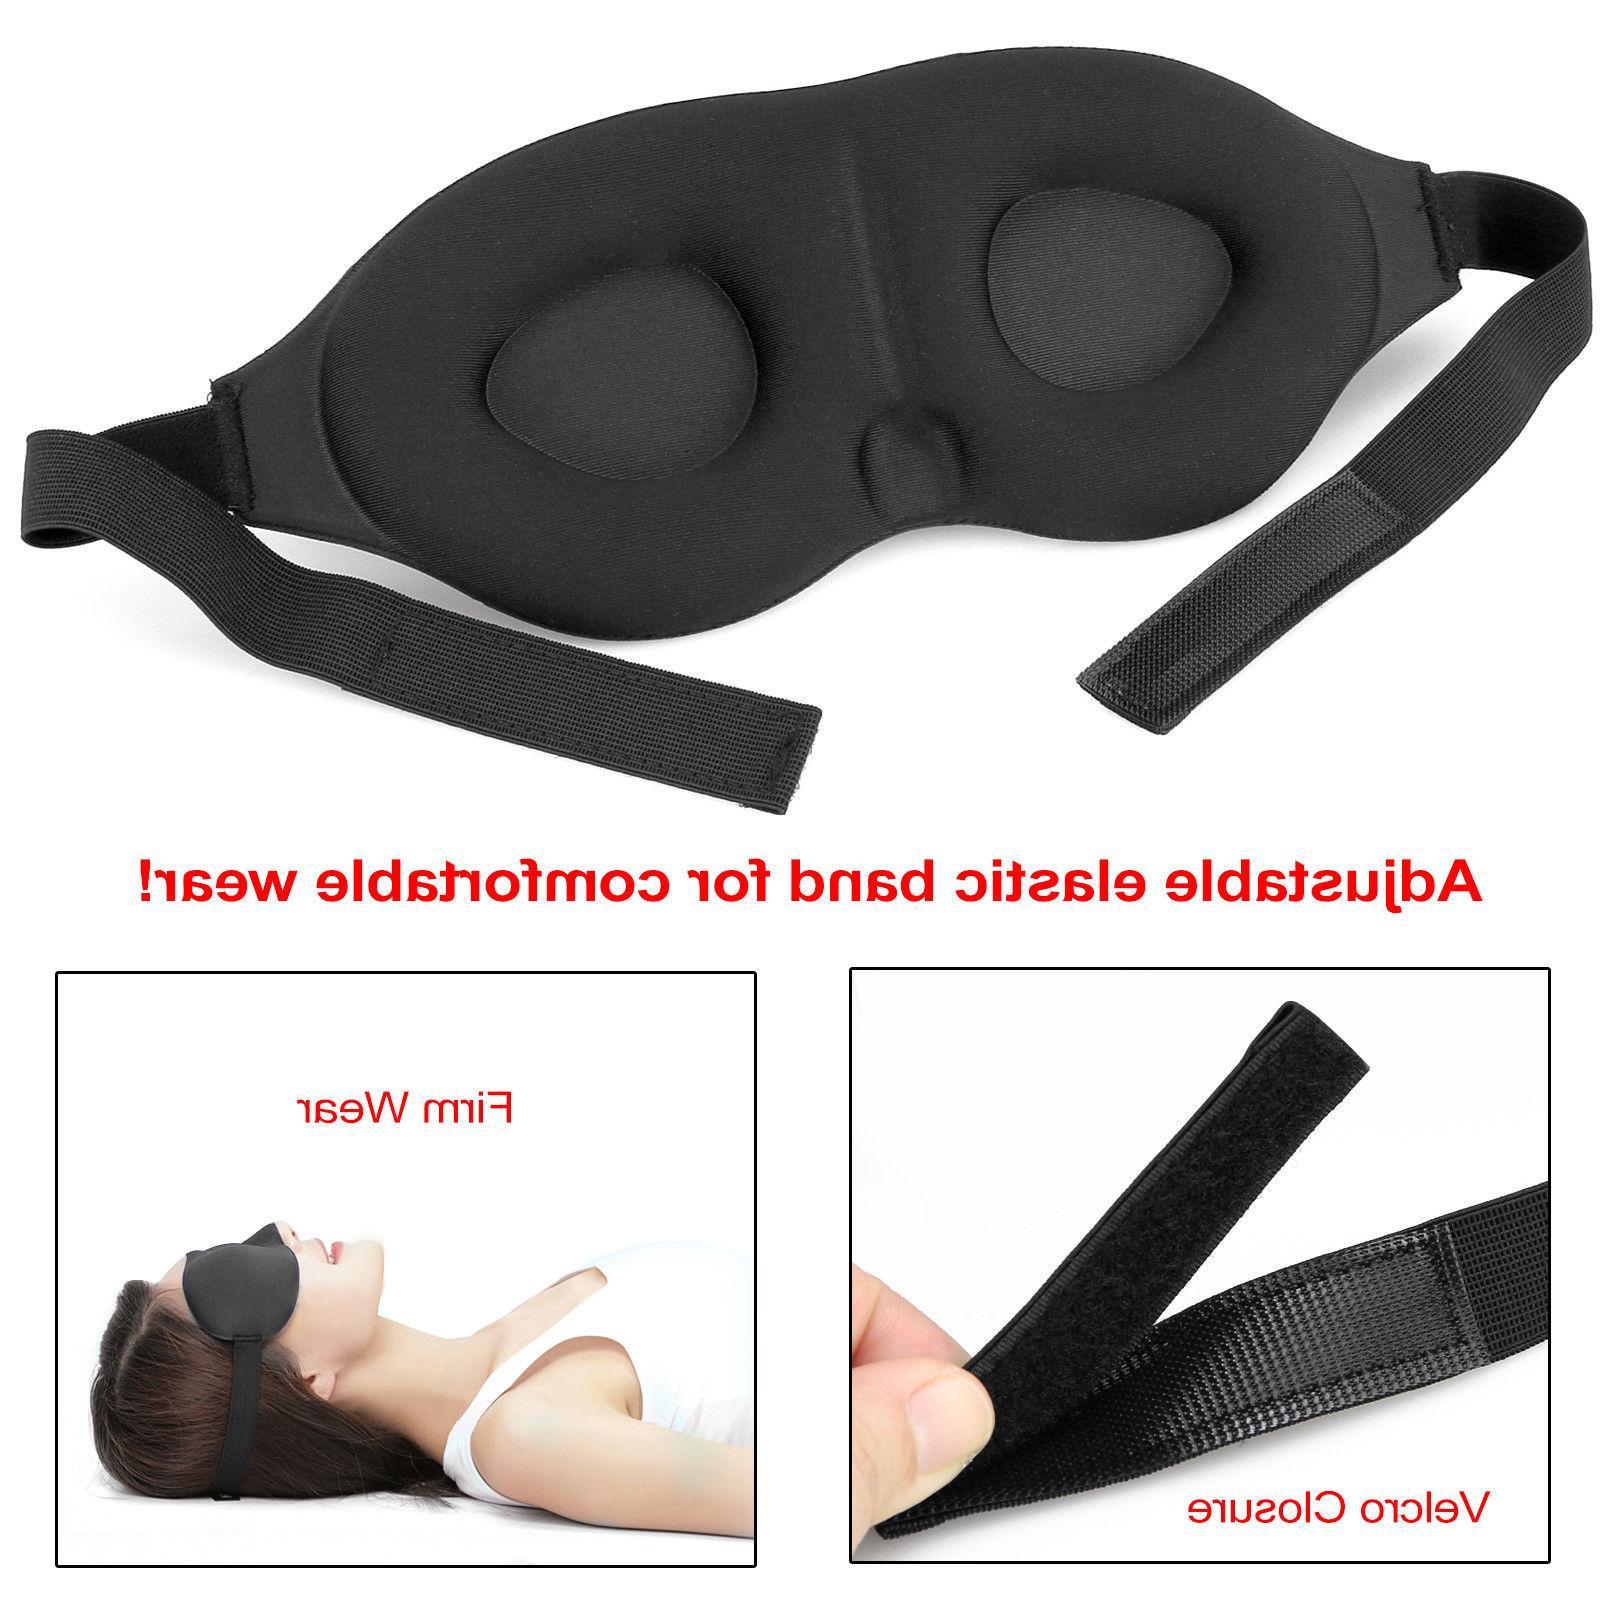 Travel Sleep Padded Cover Relax Sleeping Aid Blindfold hi